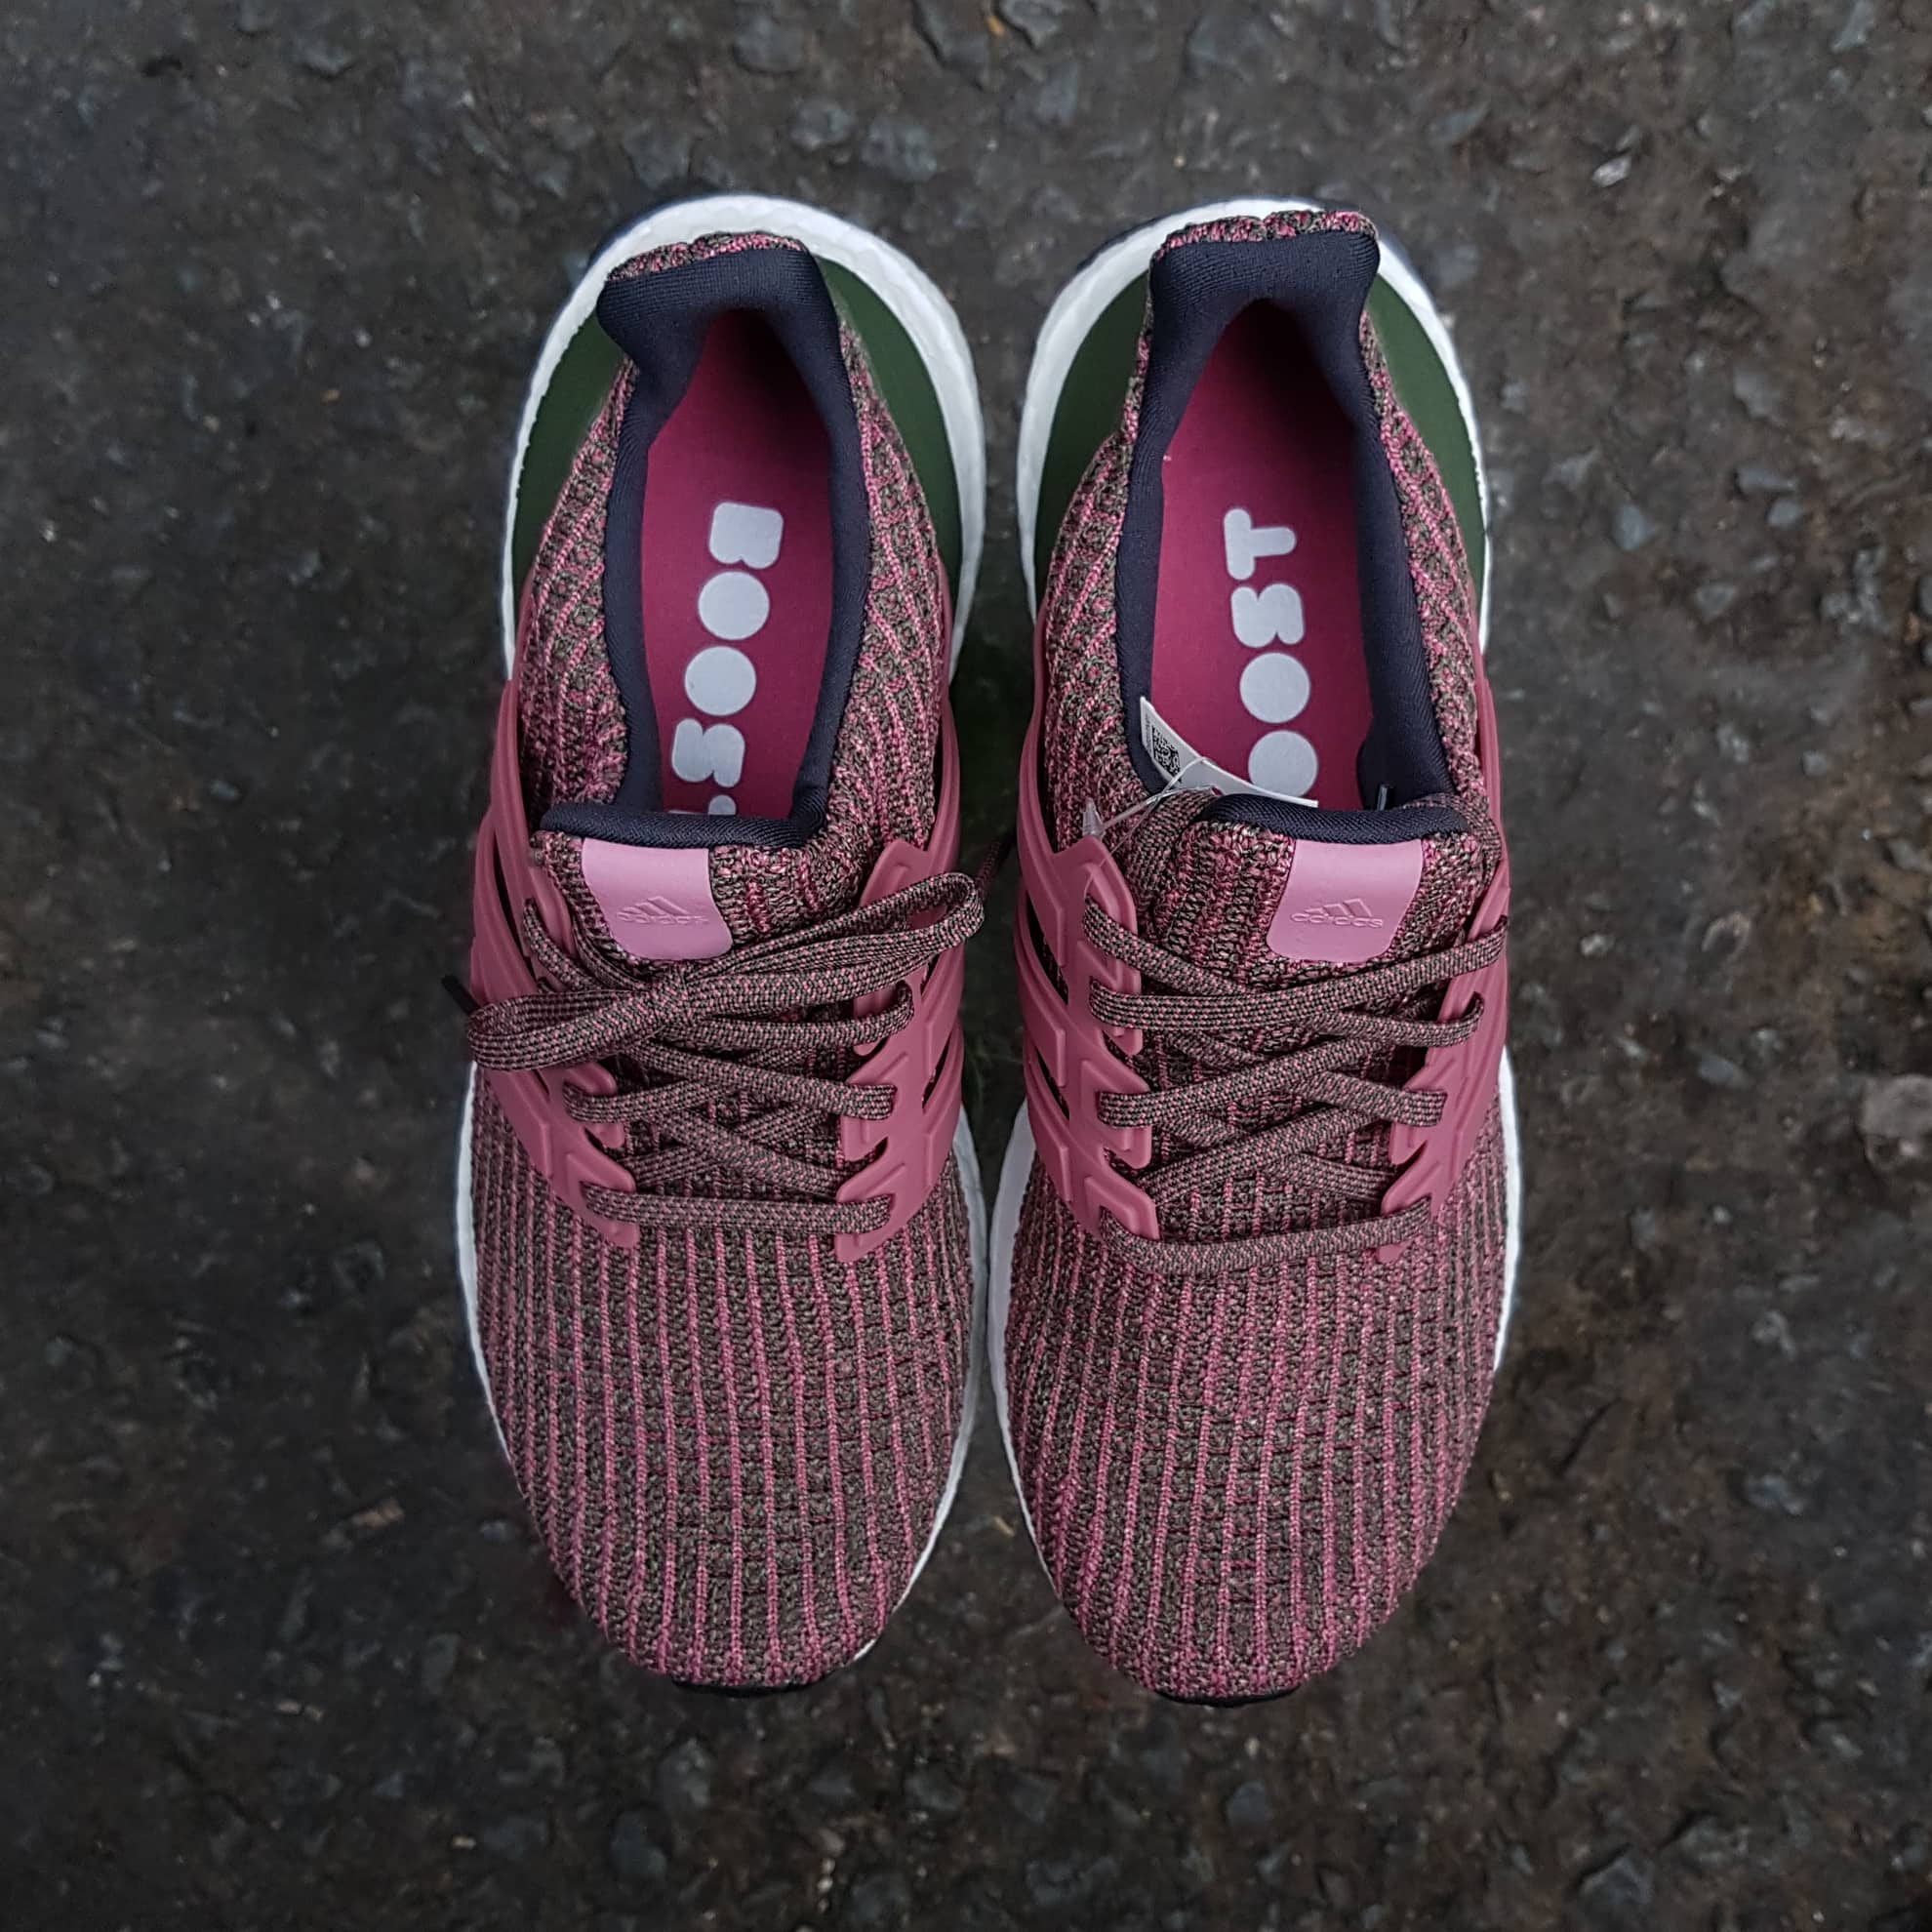 5b239ecdc618c adidas WMNS ULTRA BOOST 4.0  PINK OLIVE  – Sneakerzone Shop